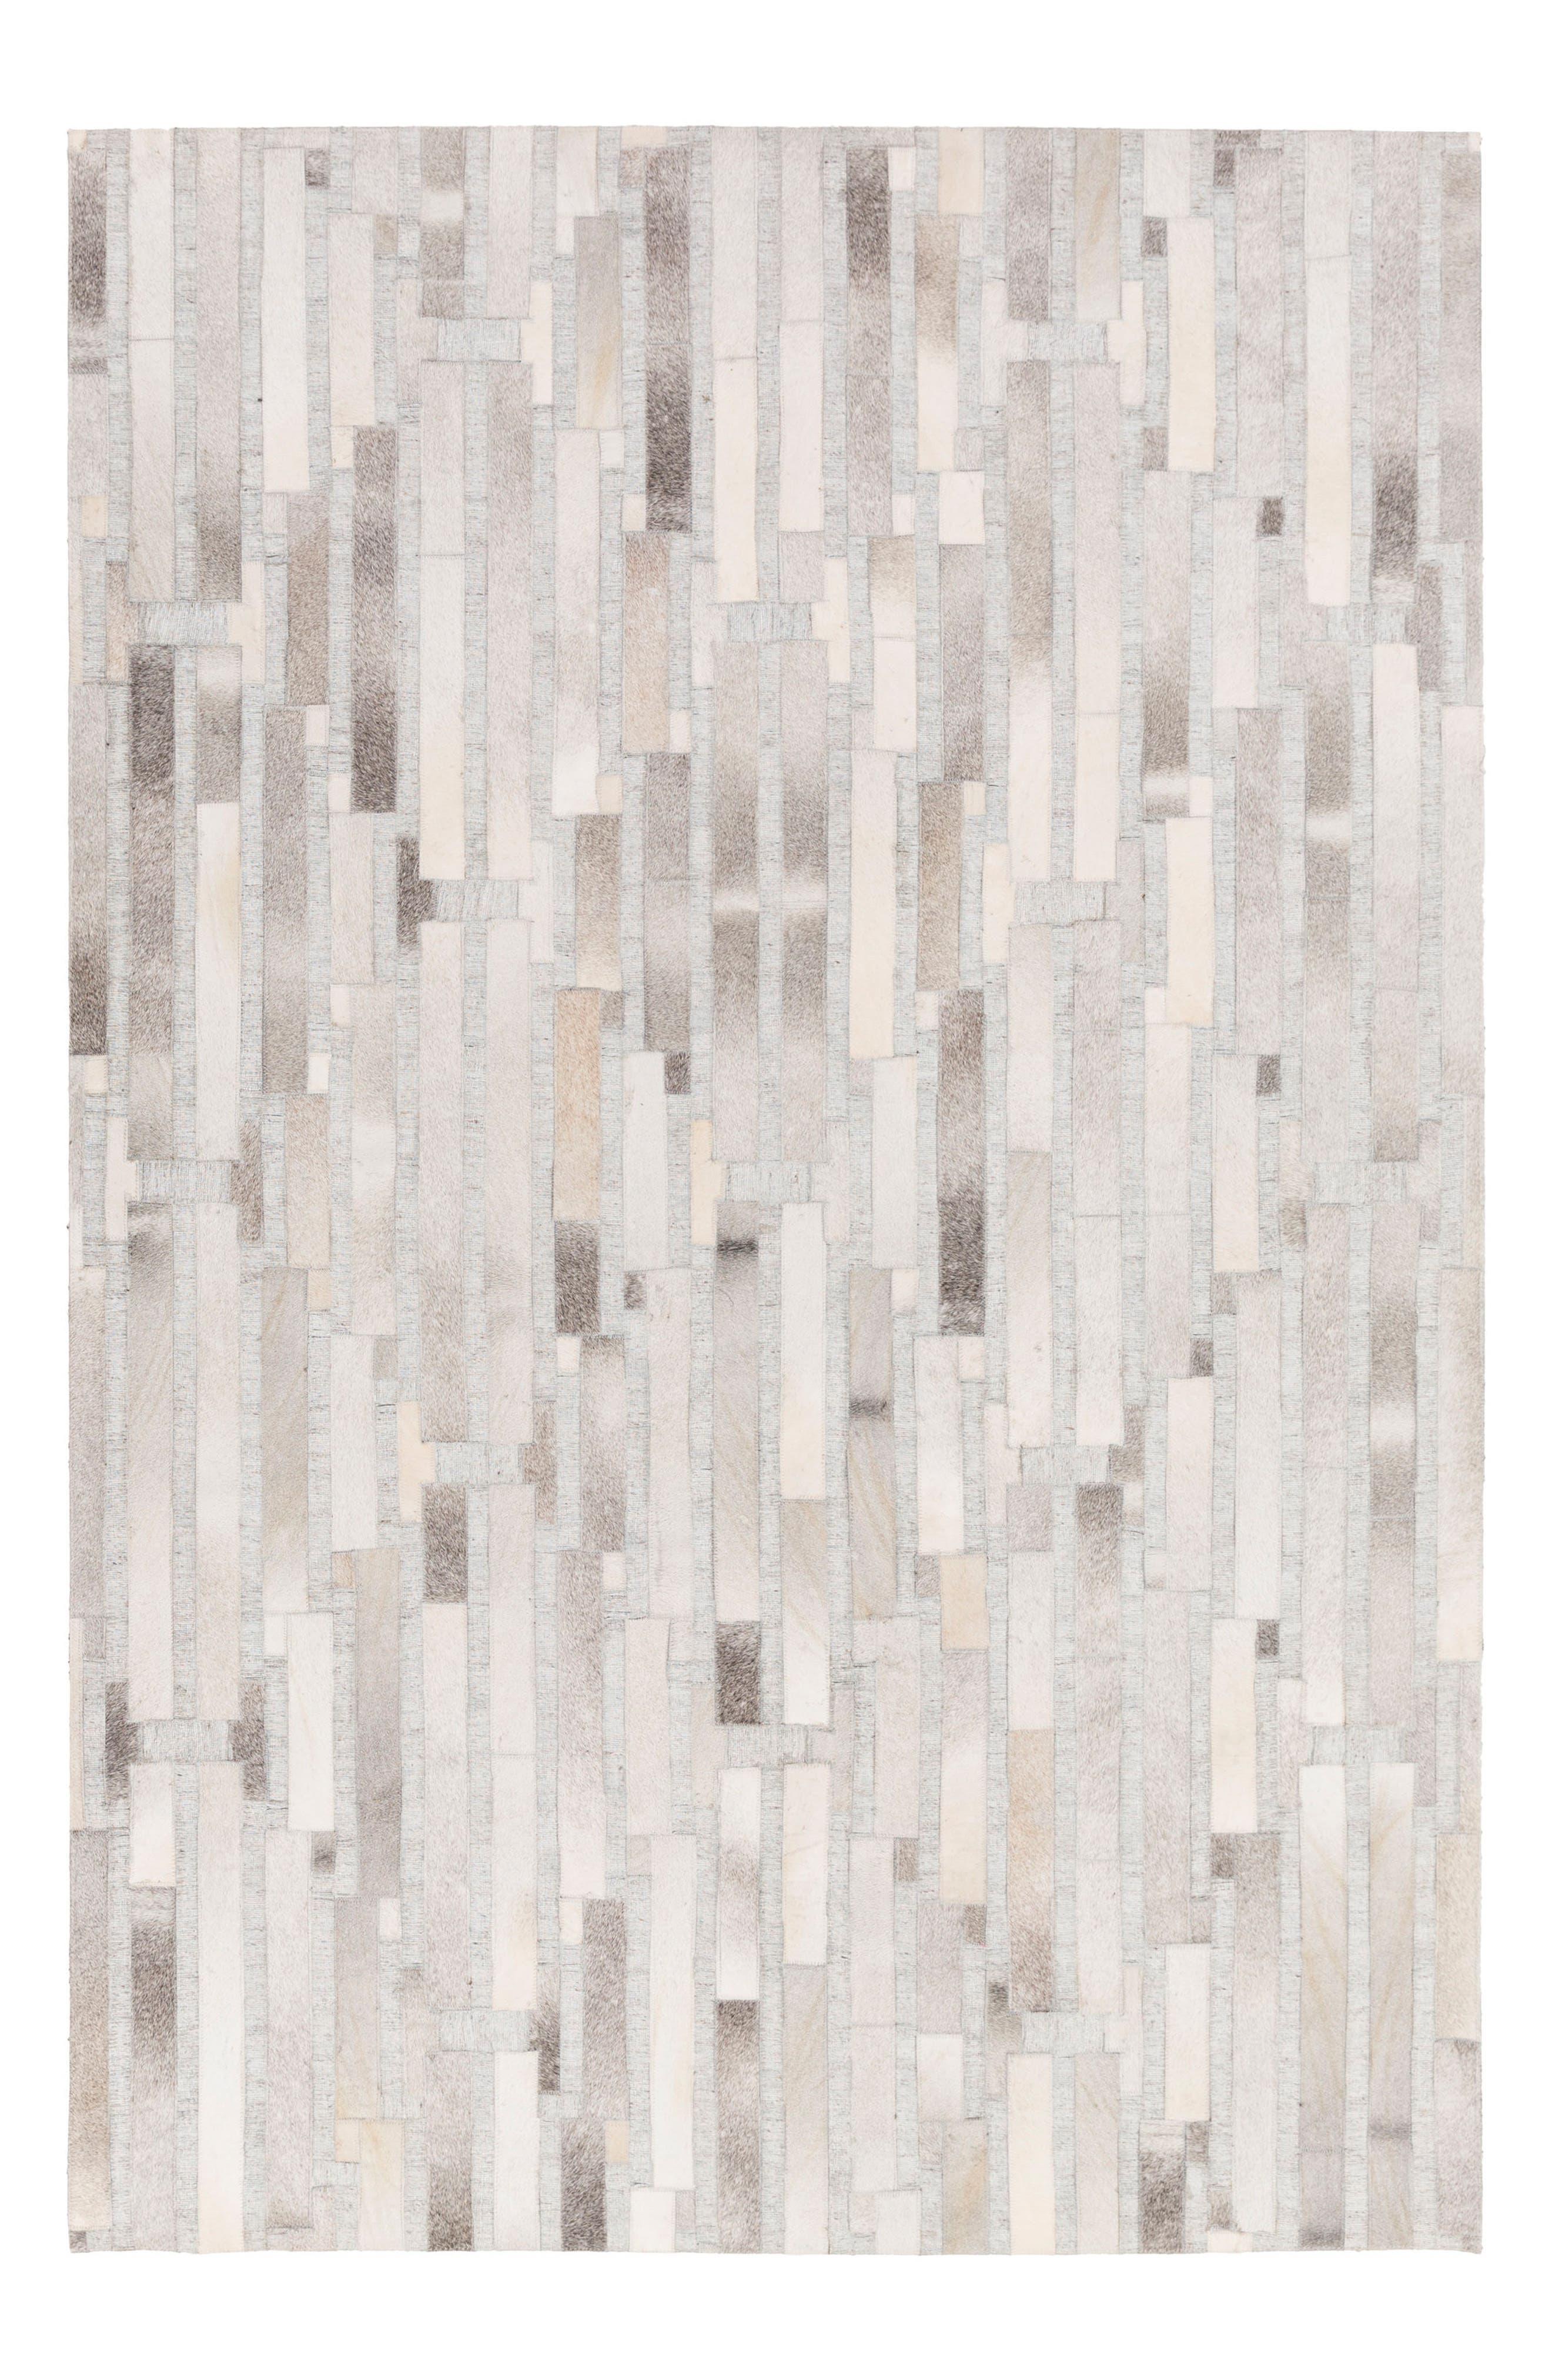 Main Image - Surya Home Medora Bark Hand Stitched Rug